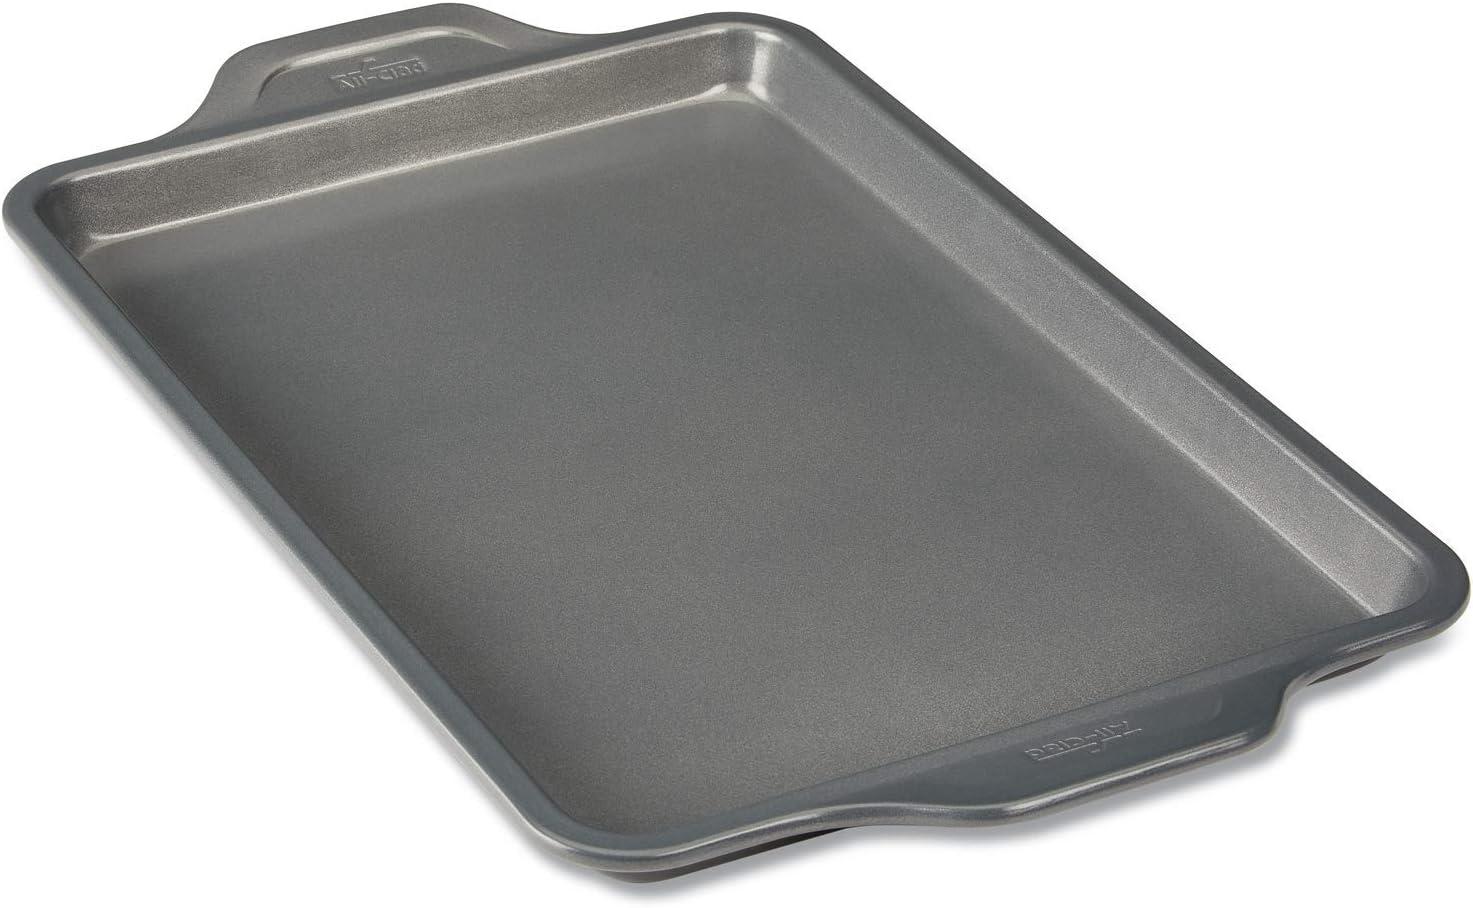 All-Clad J2570464 Pro-Release jelly roll pan, 15 In x 10 In x 1 In, Grey